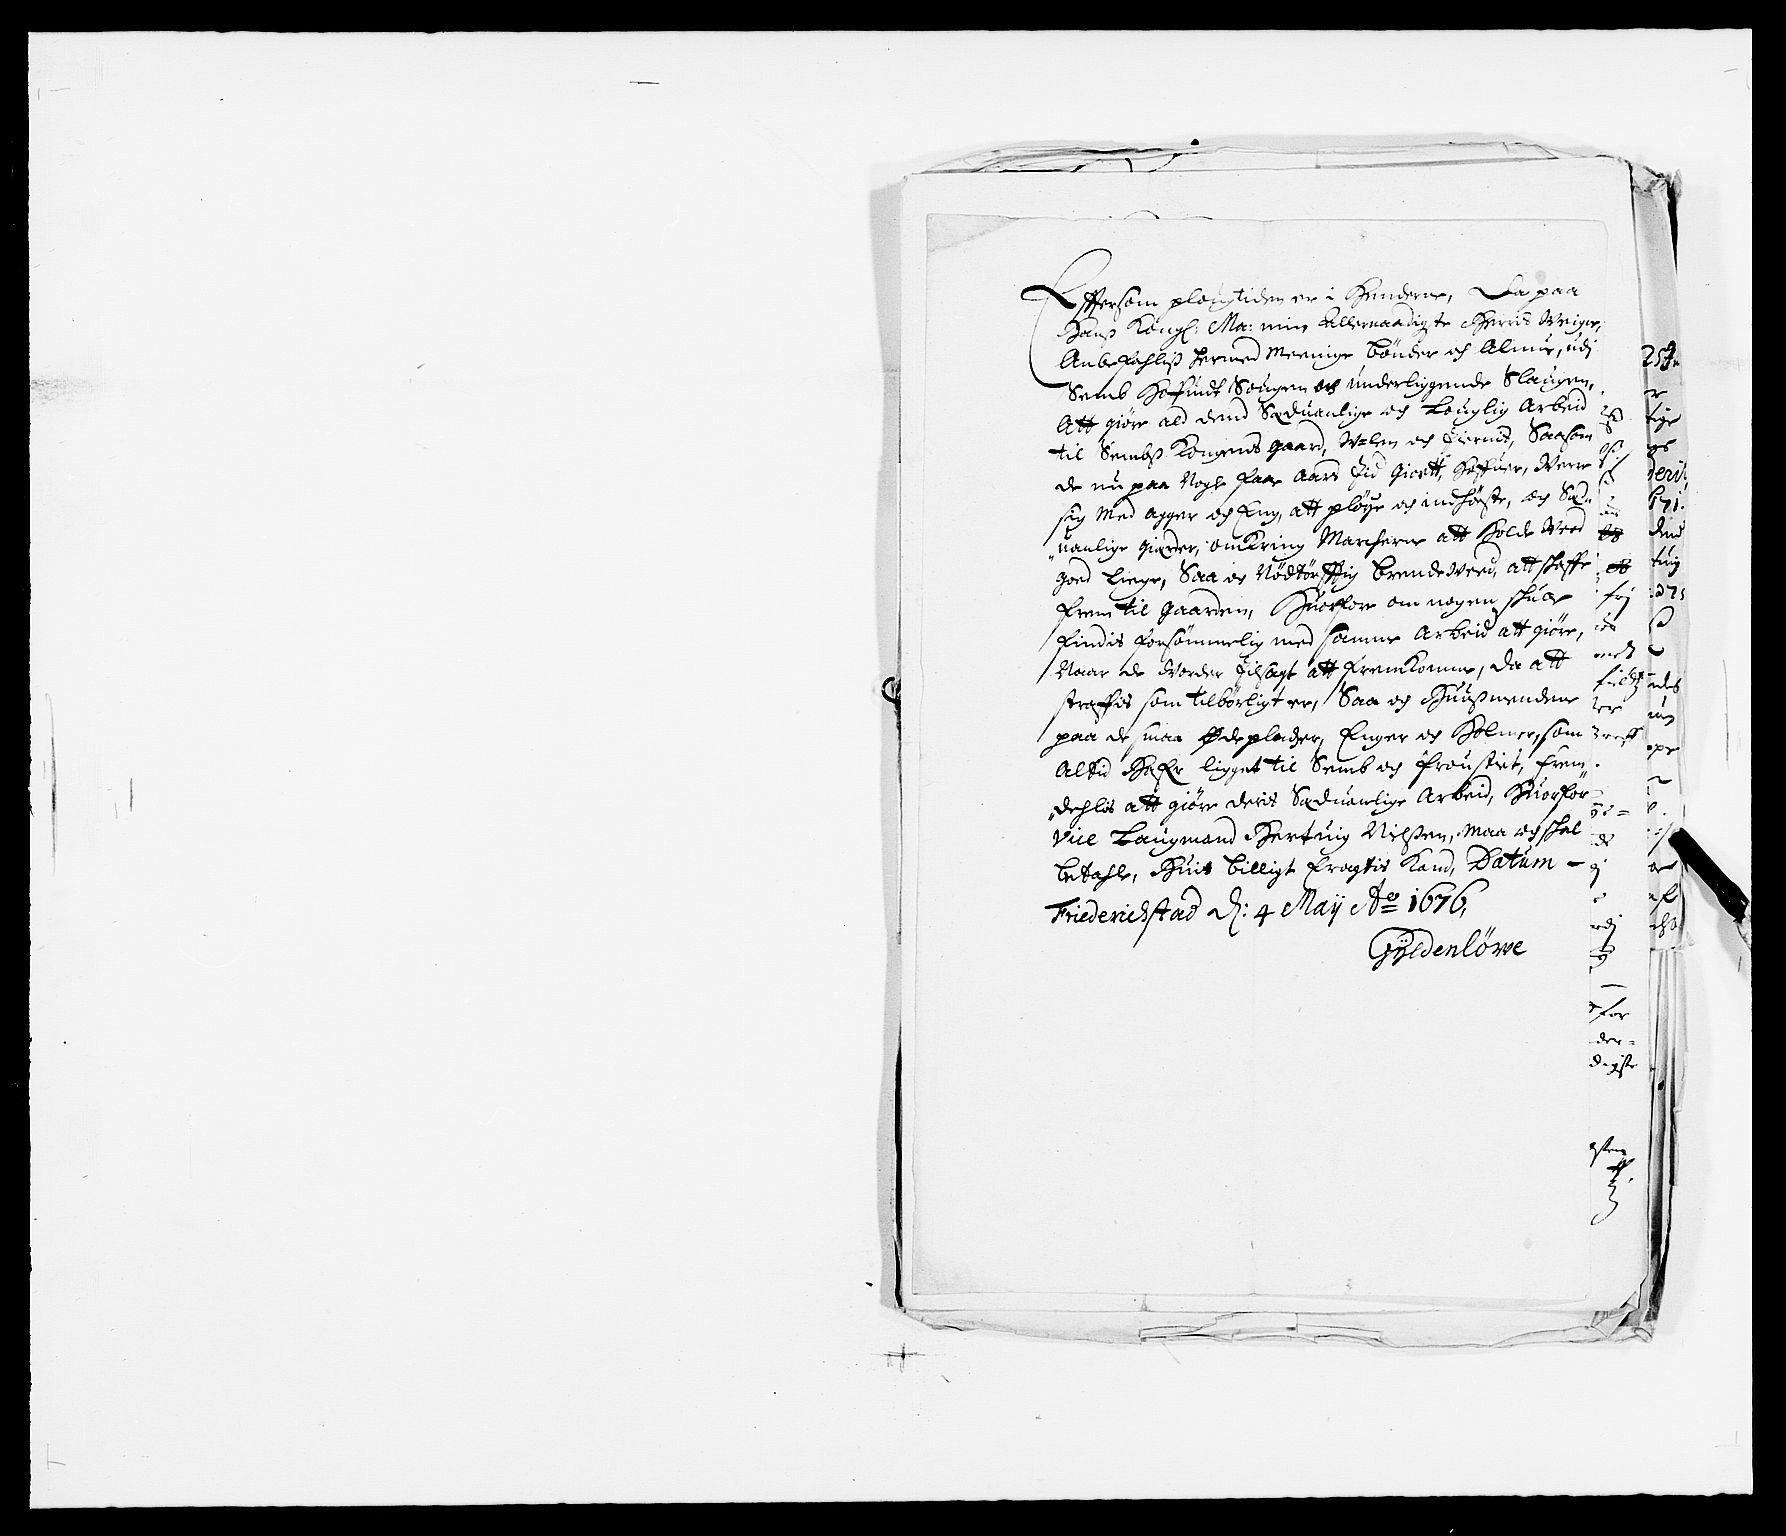 RA, Rentekammeret inntil 1814, Reviderte regnskaper, Fogderegnskap, R32/L1845: Fogderegnskap Jarlsberg grevskap, 1676-1678, s. 490